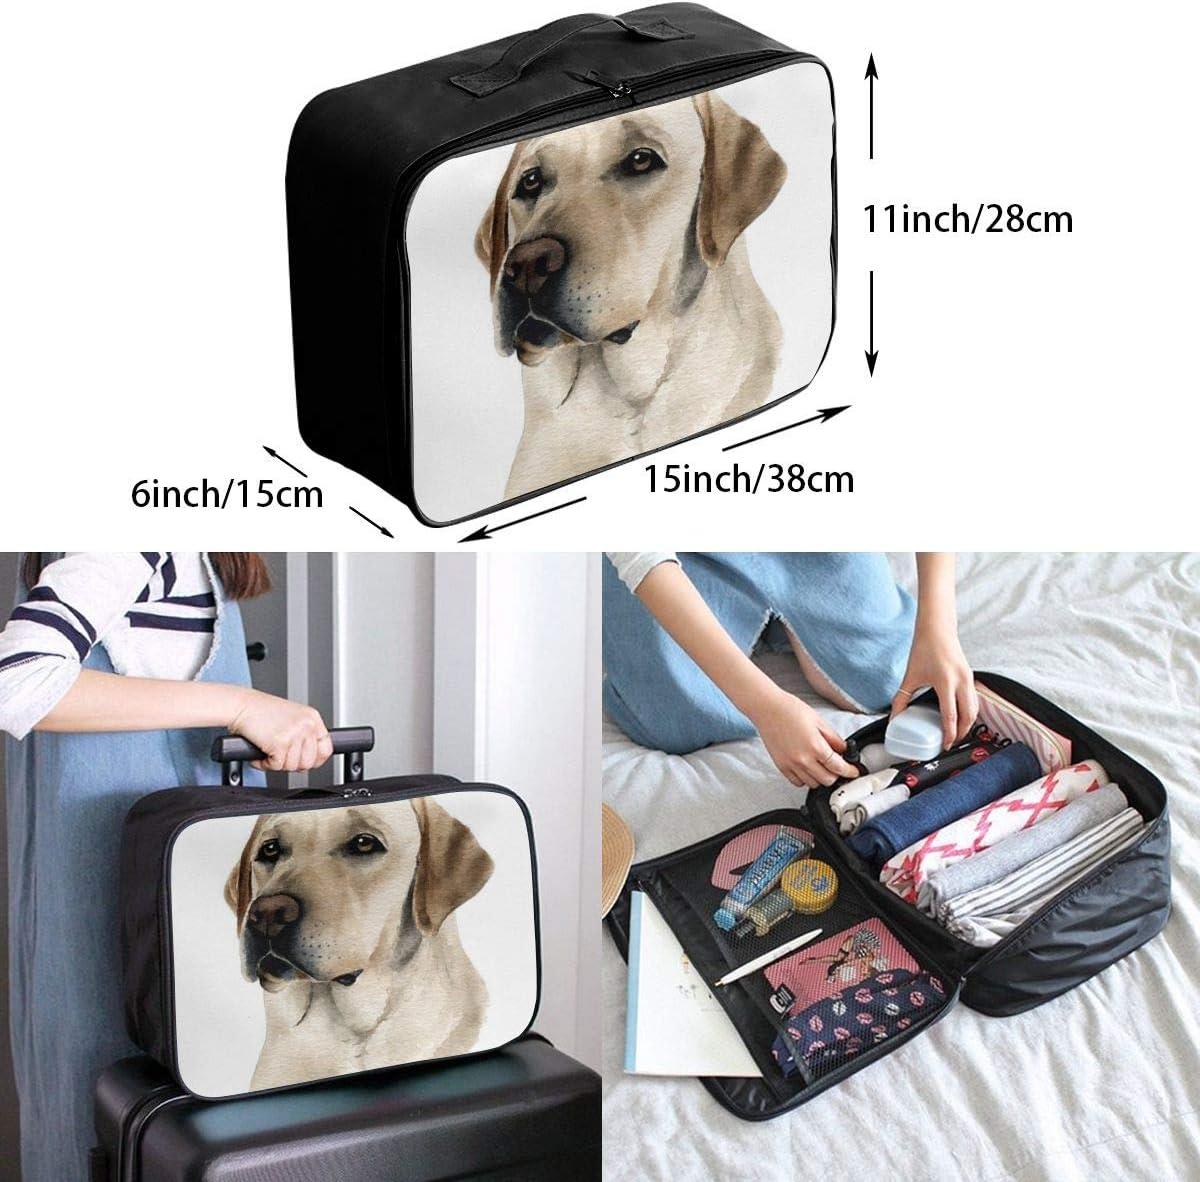 Travel Bags Labbador Retriever Dog Portable Duffel Custom Personalized Trolley Handle Luggage Bag